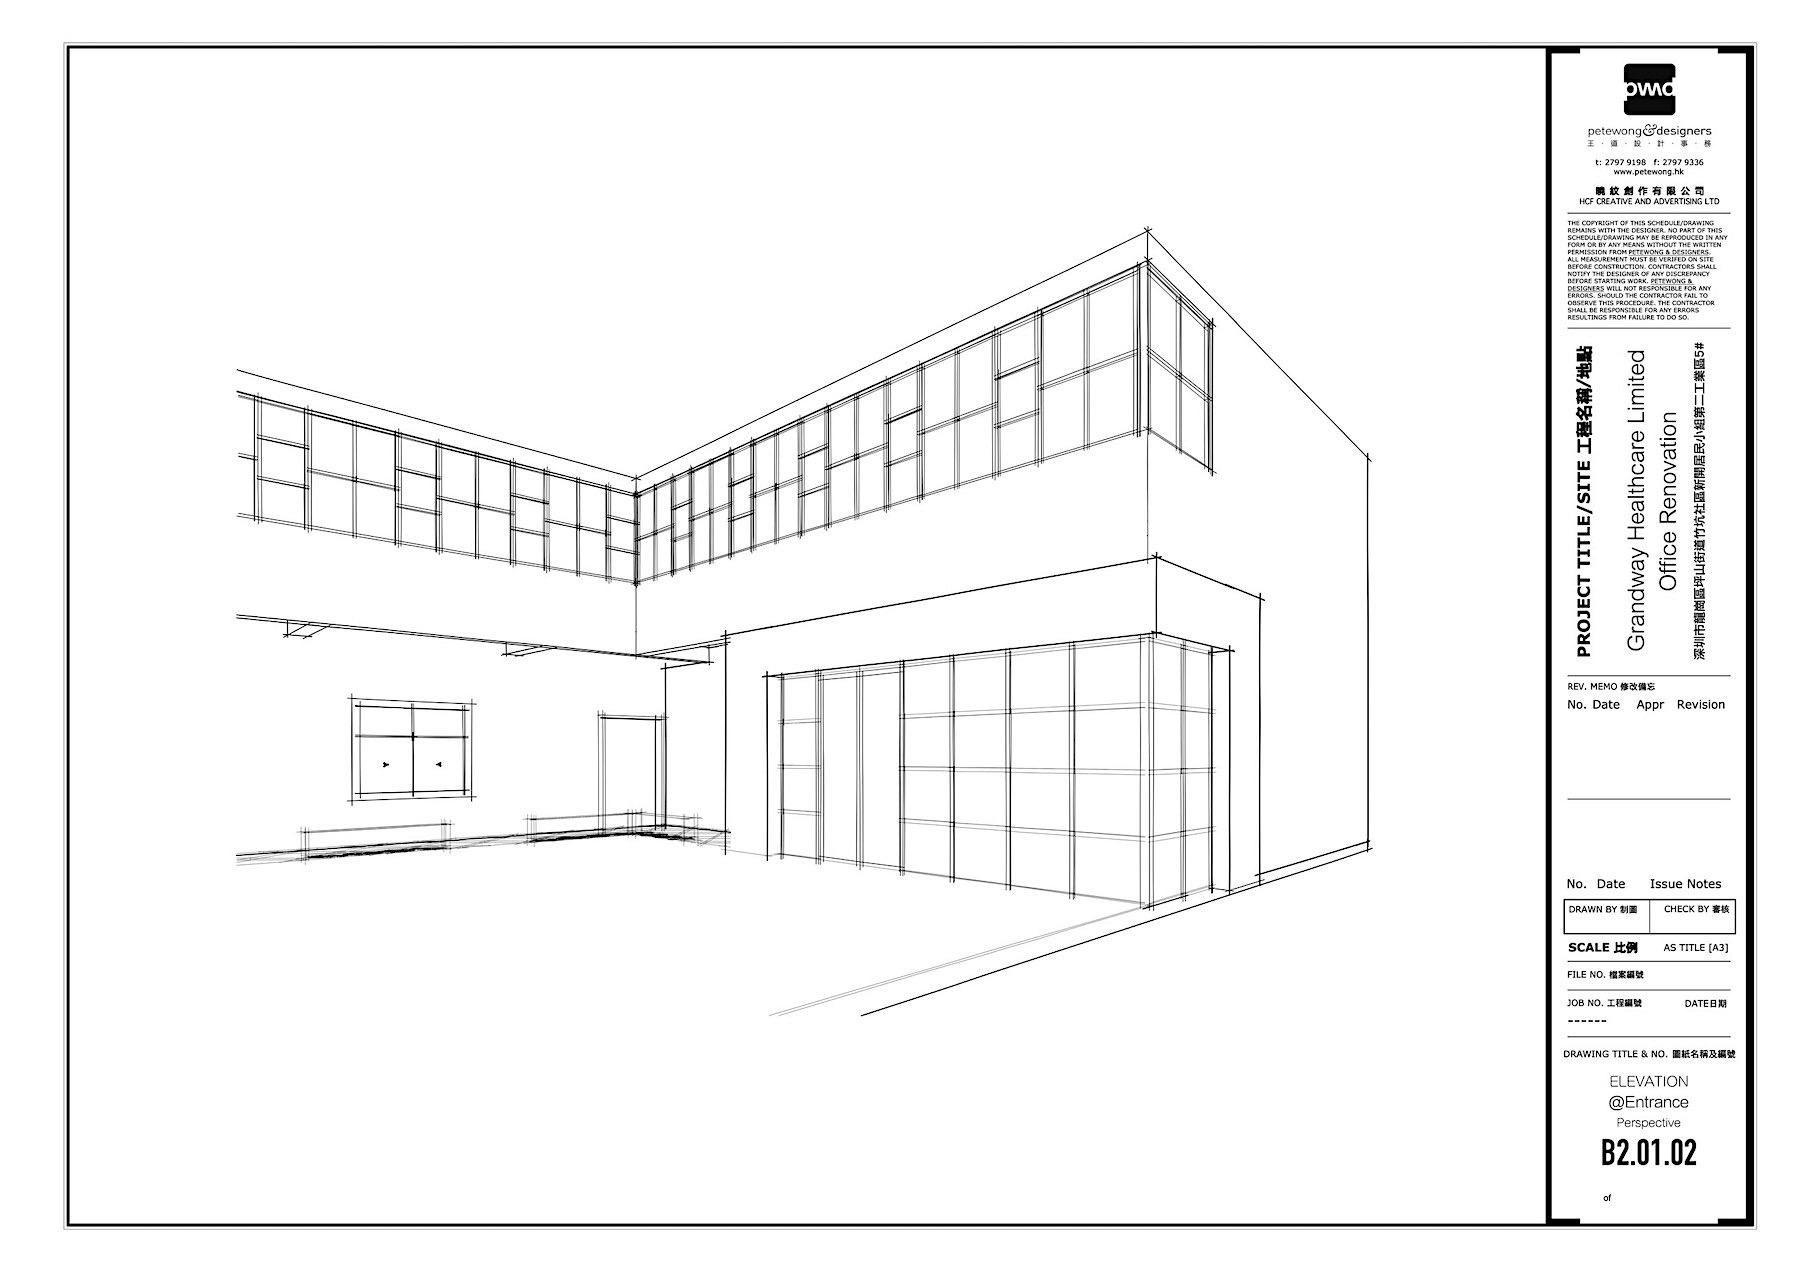 Grandway Office Renovation 2018 Drawing 04